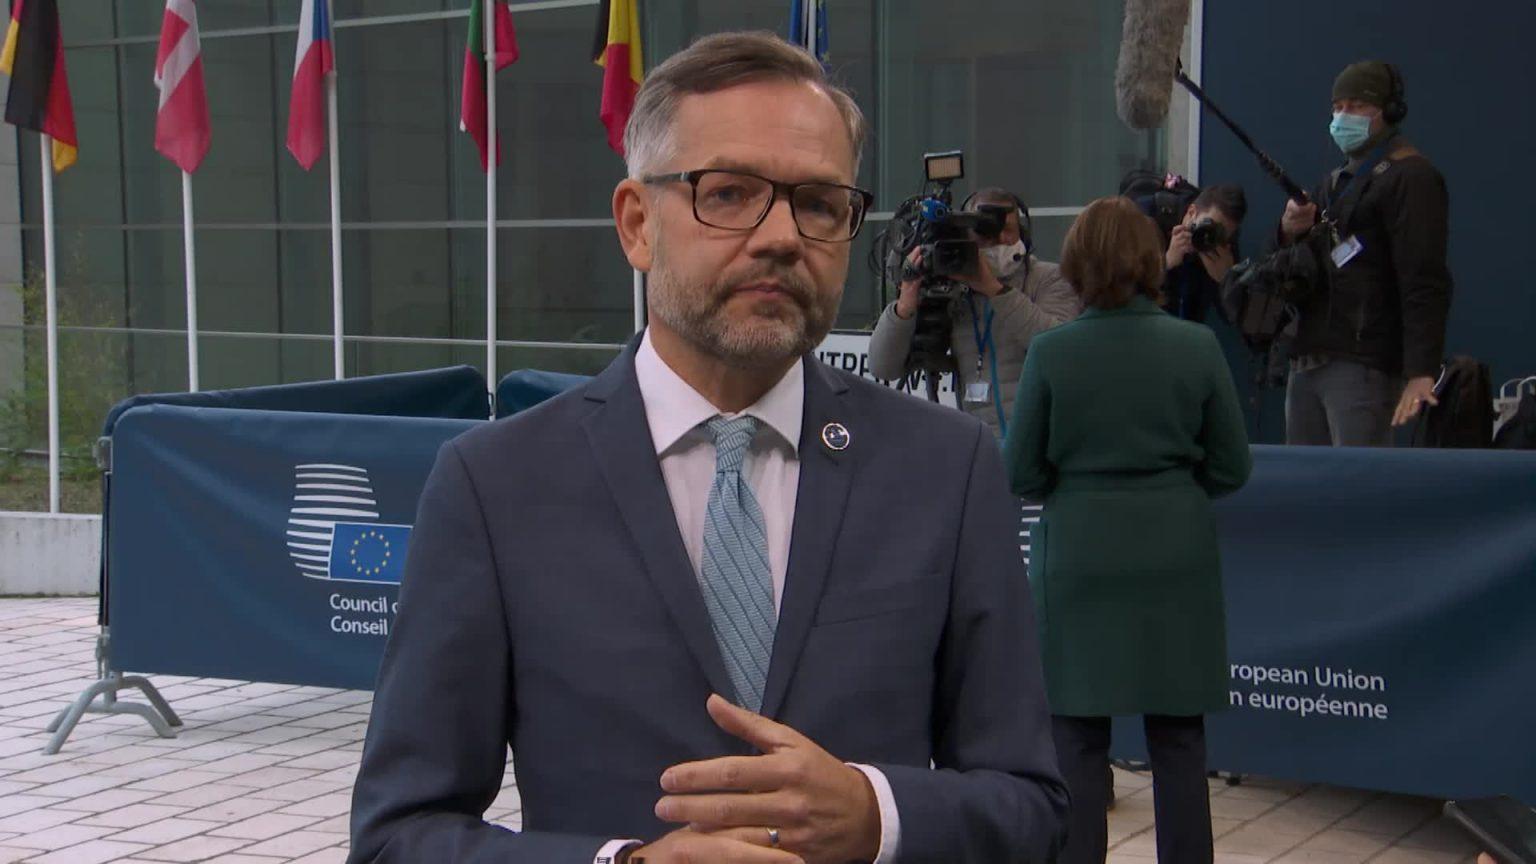 Roth: Η διεύρυνση της ΕΕ δεν πρέπει να είναι όμηρος διμερών απαιτήσεων